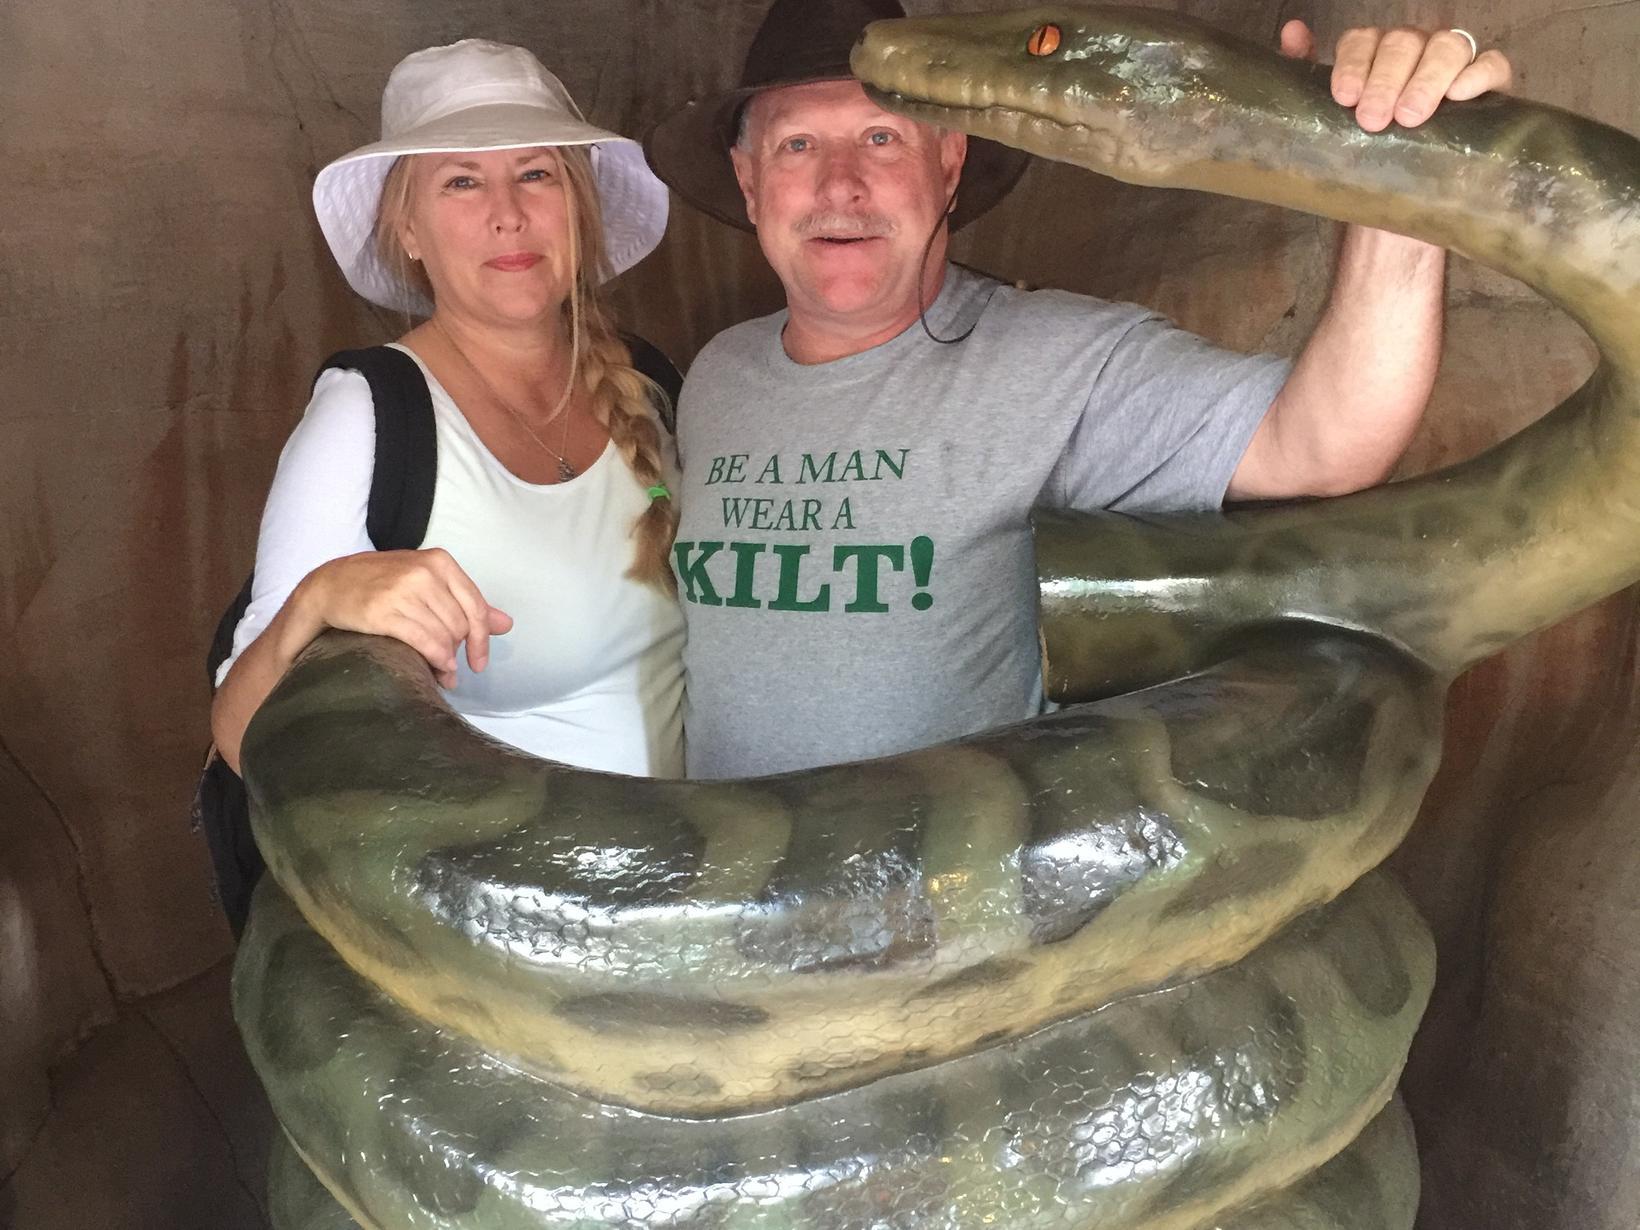 Mark & aleida & Aleida from Canberra, Australian Capital Territory, Australia